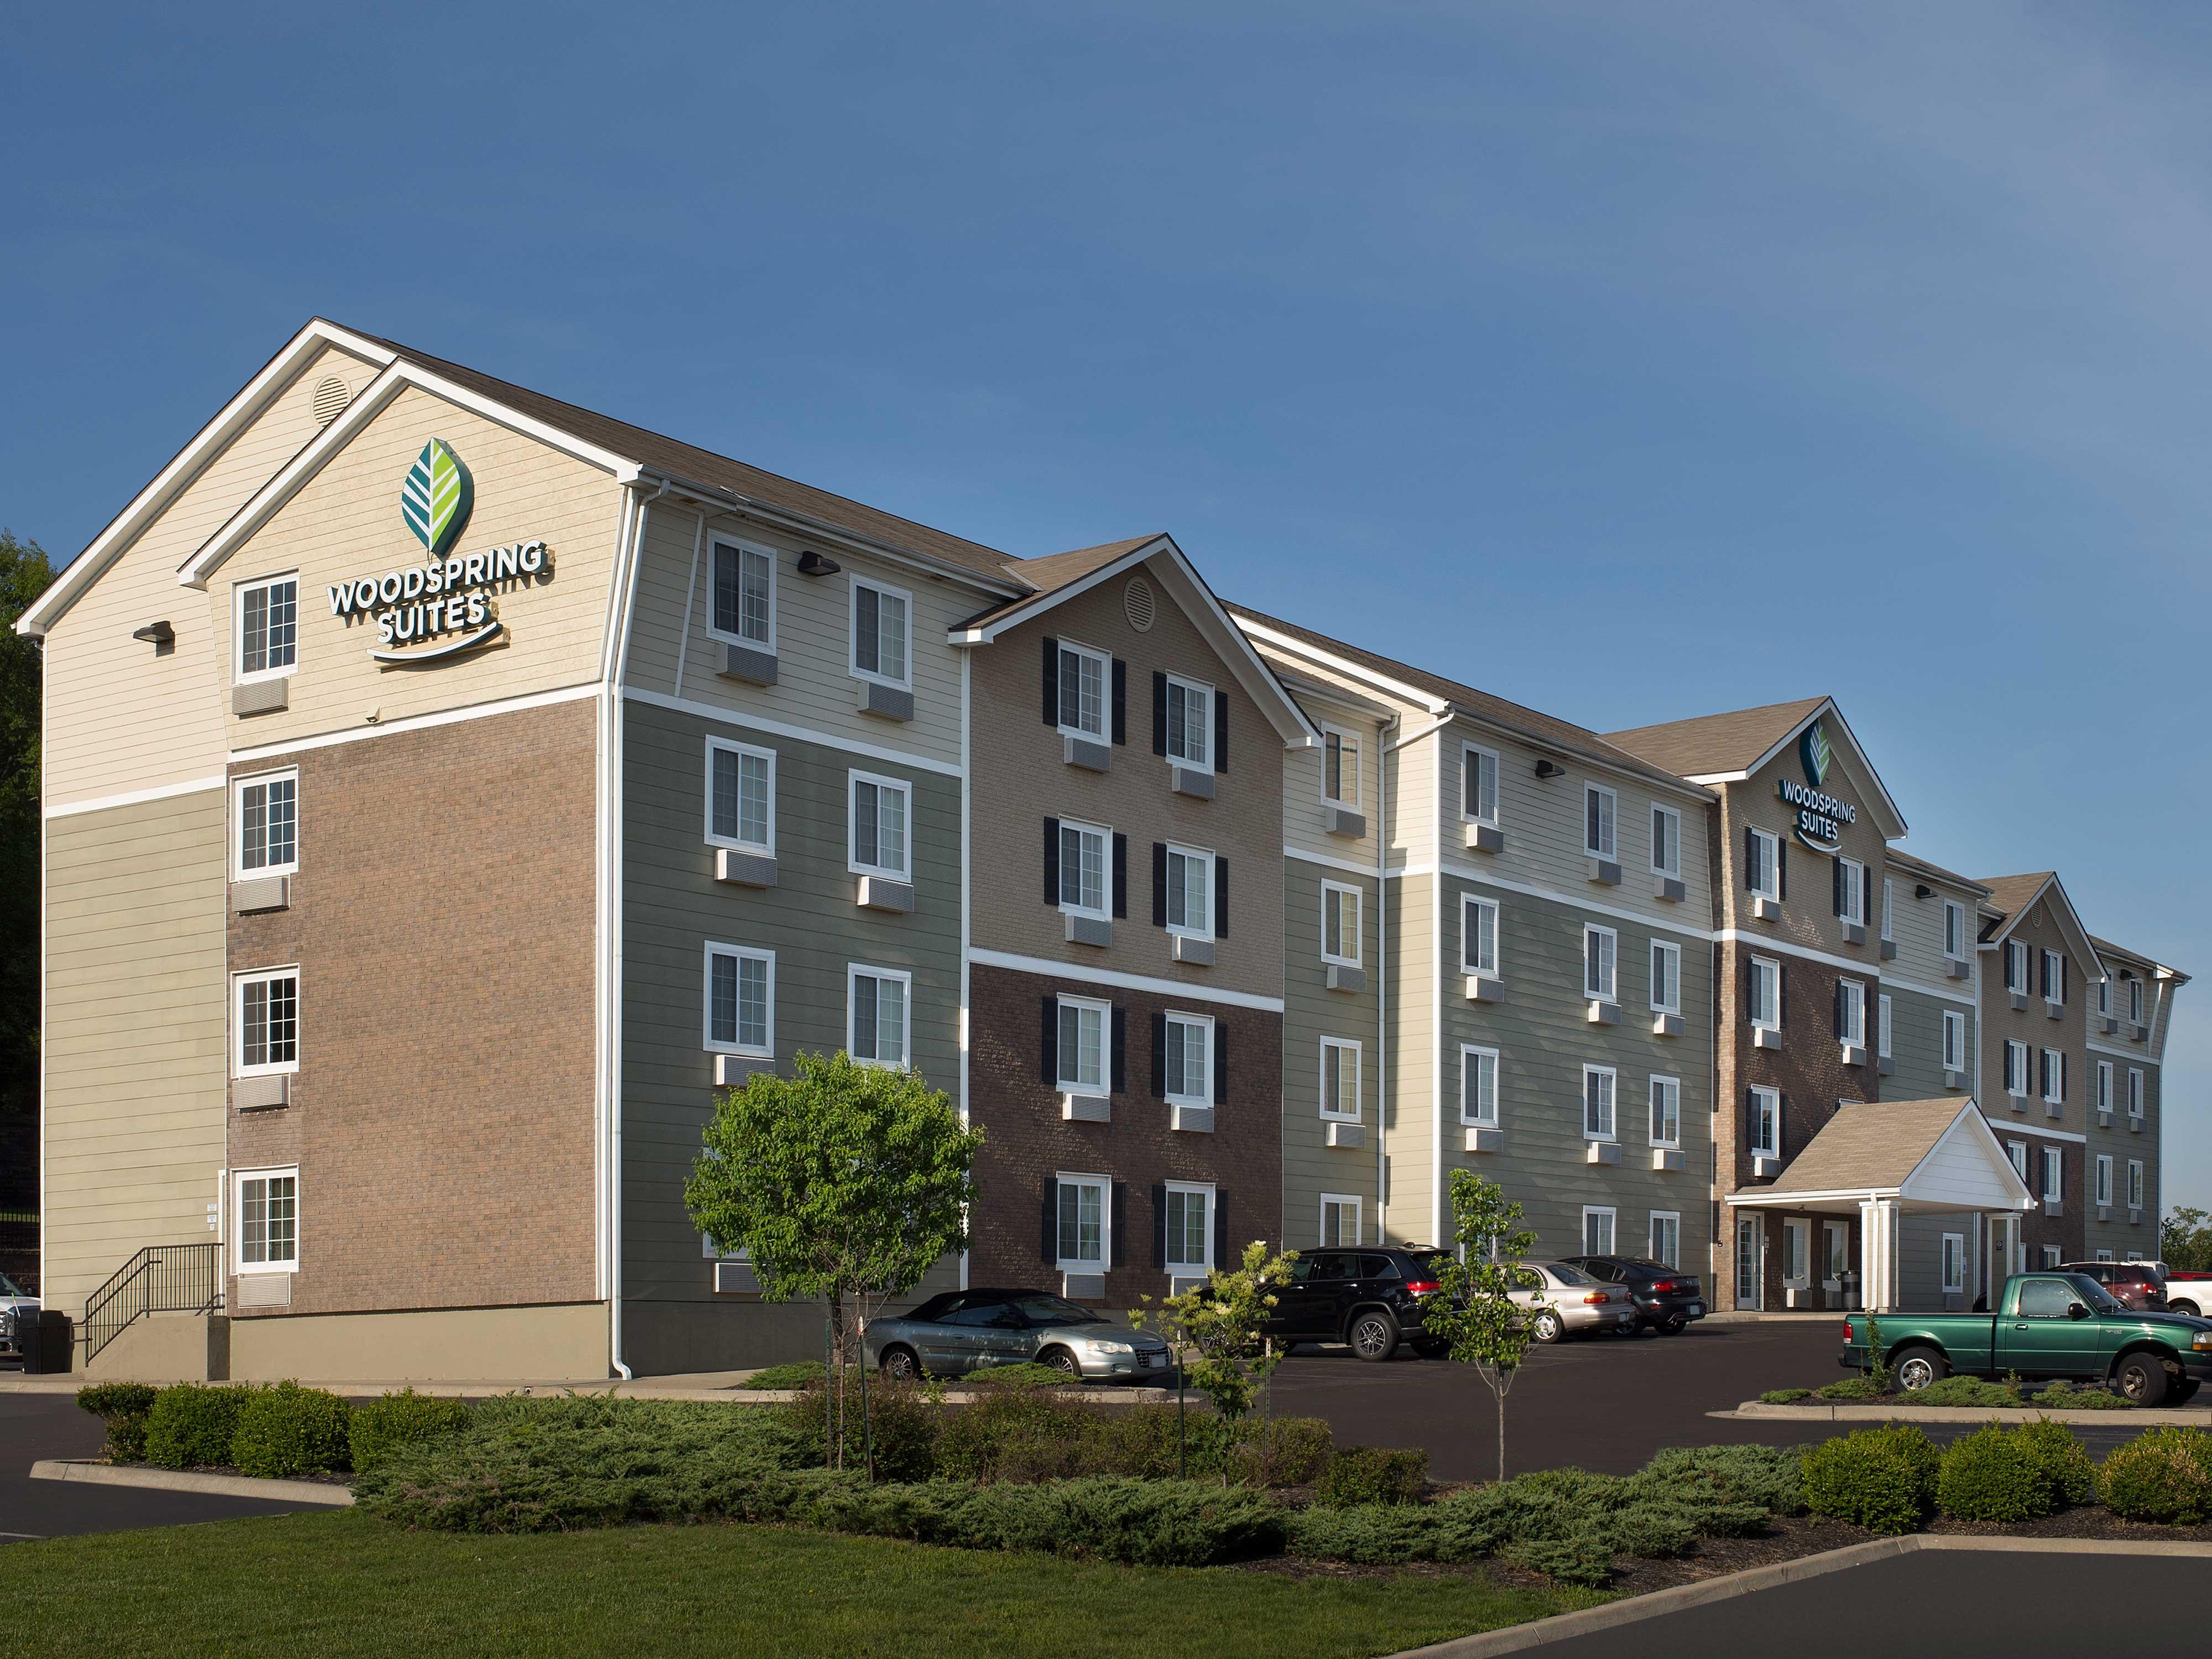 WoodSpring Suites Kansas City Mission image 1